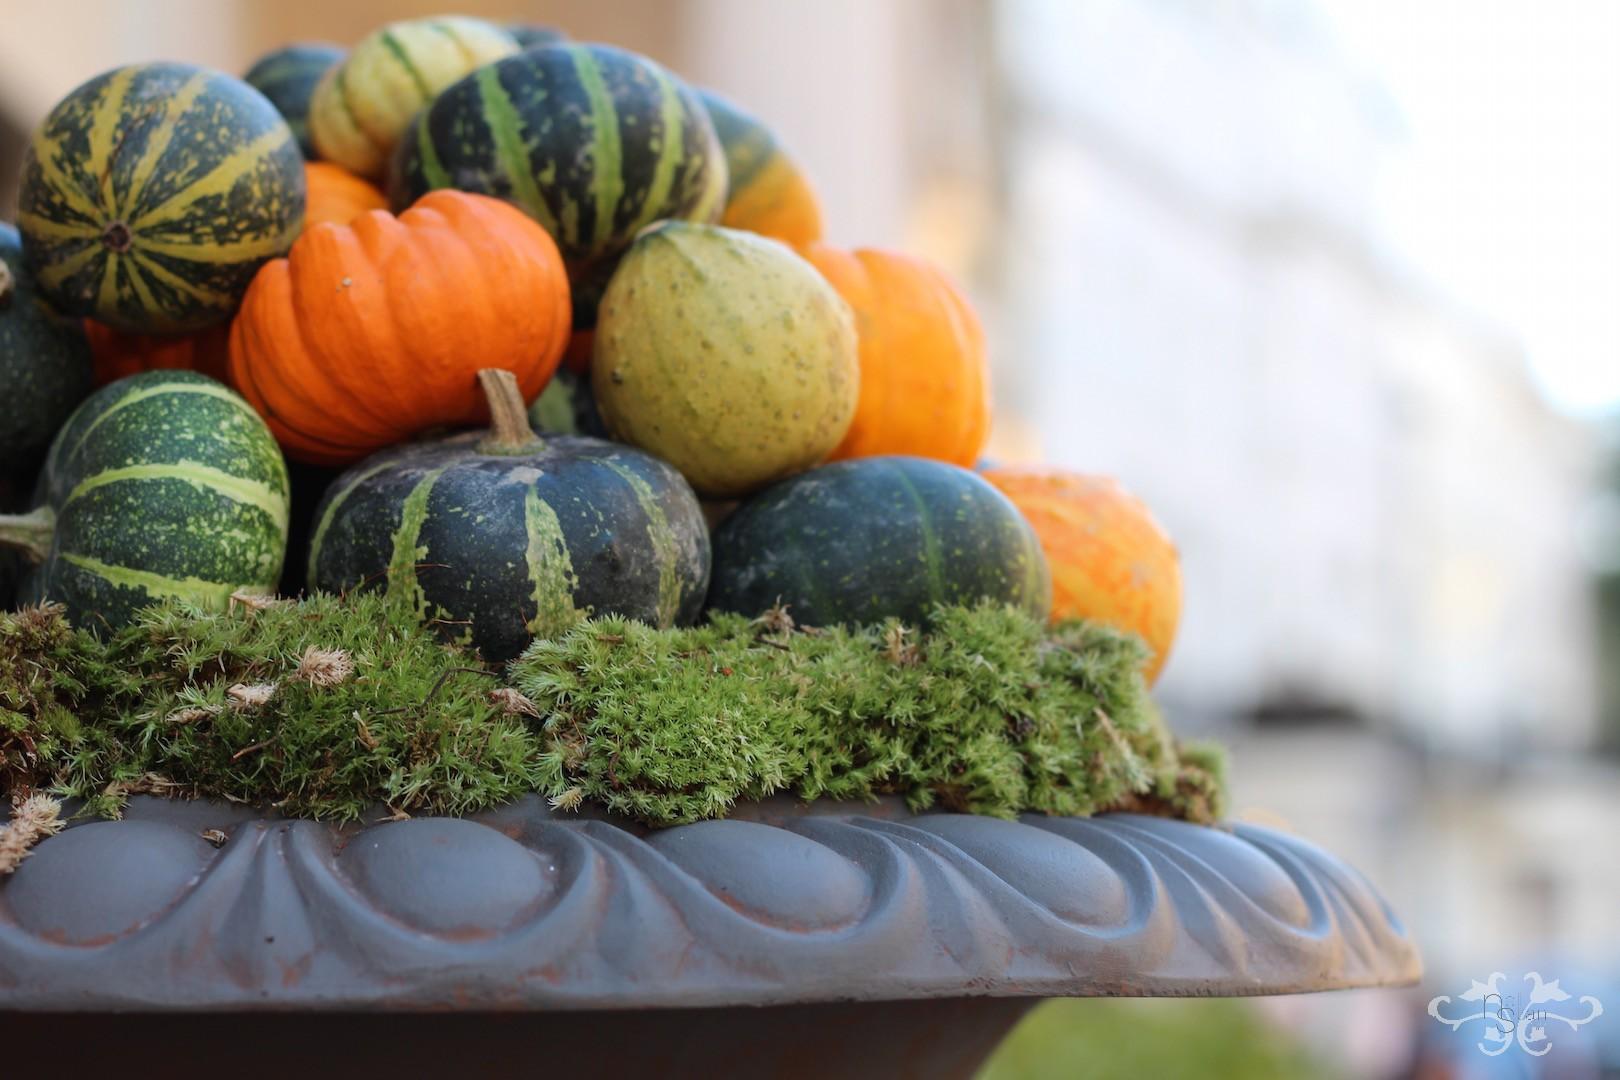 Gourds for Autumn at Neill Strain Belgravia